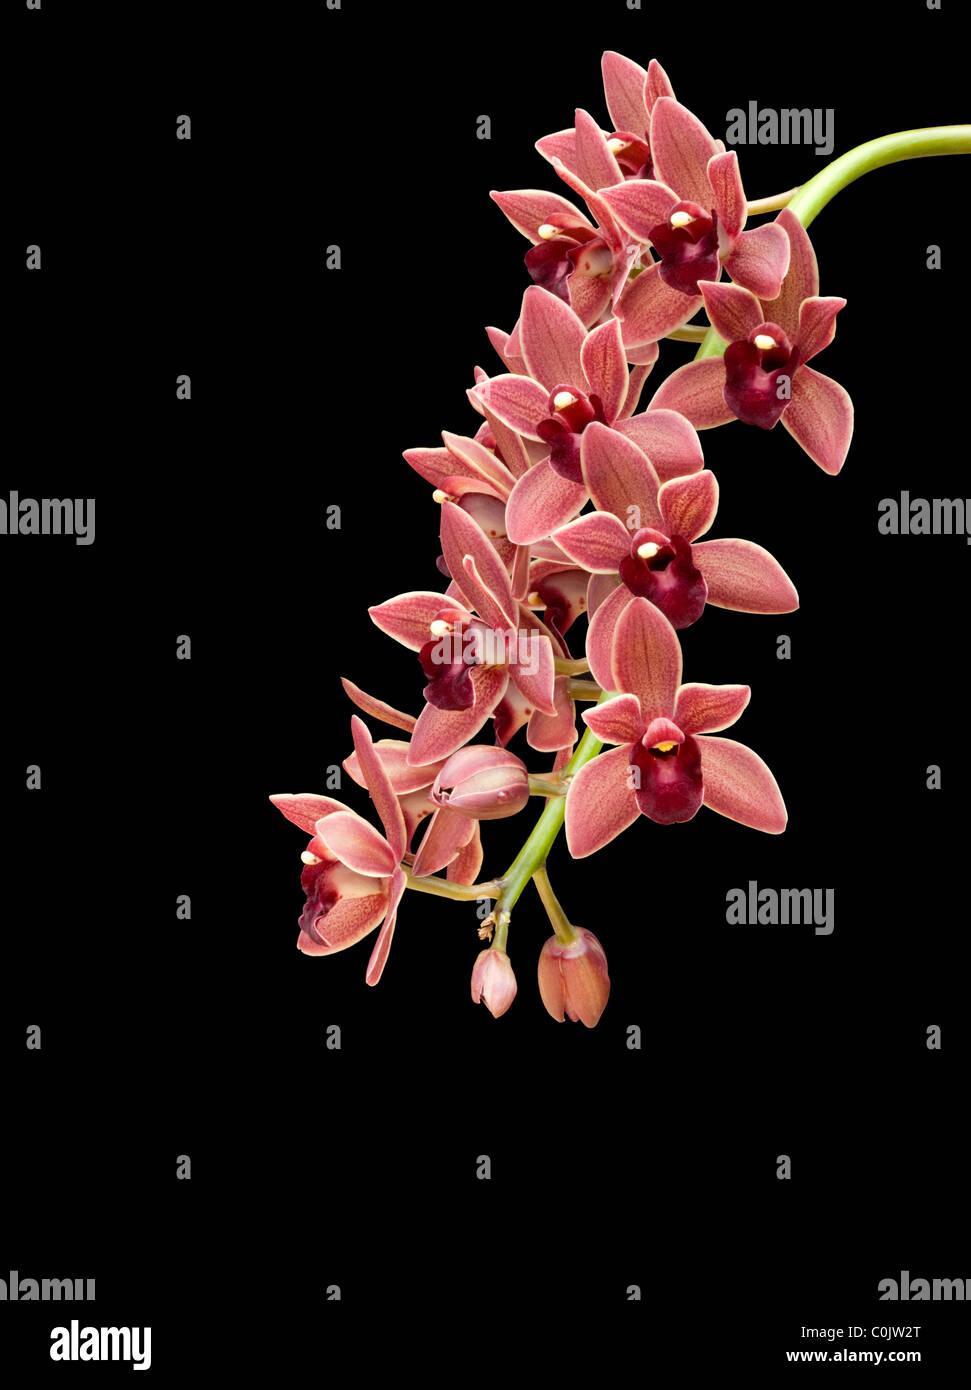 Cascading cymbidium orchids against black background - Stock Image